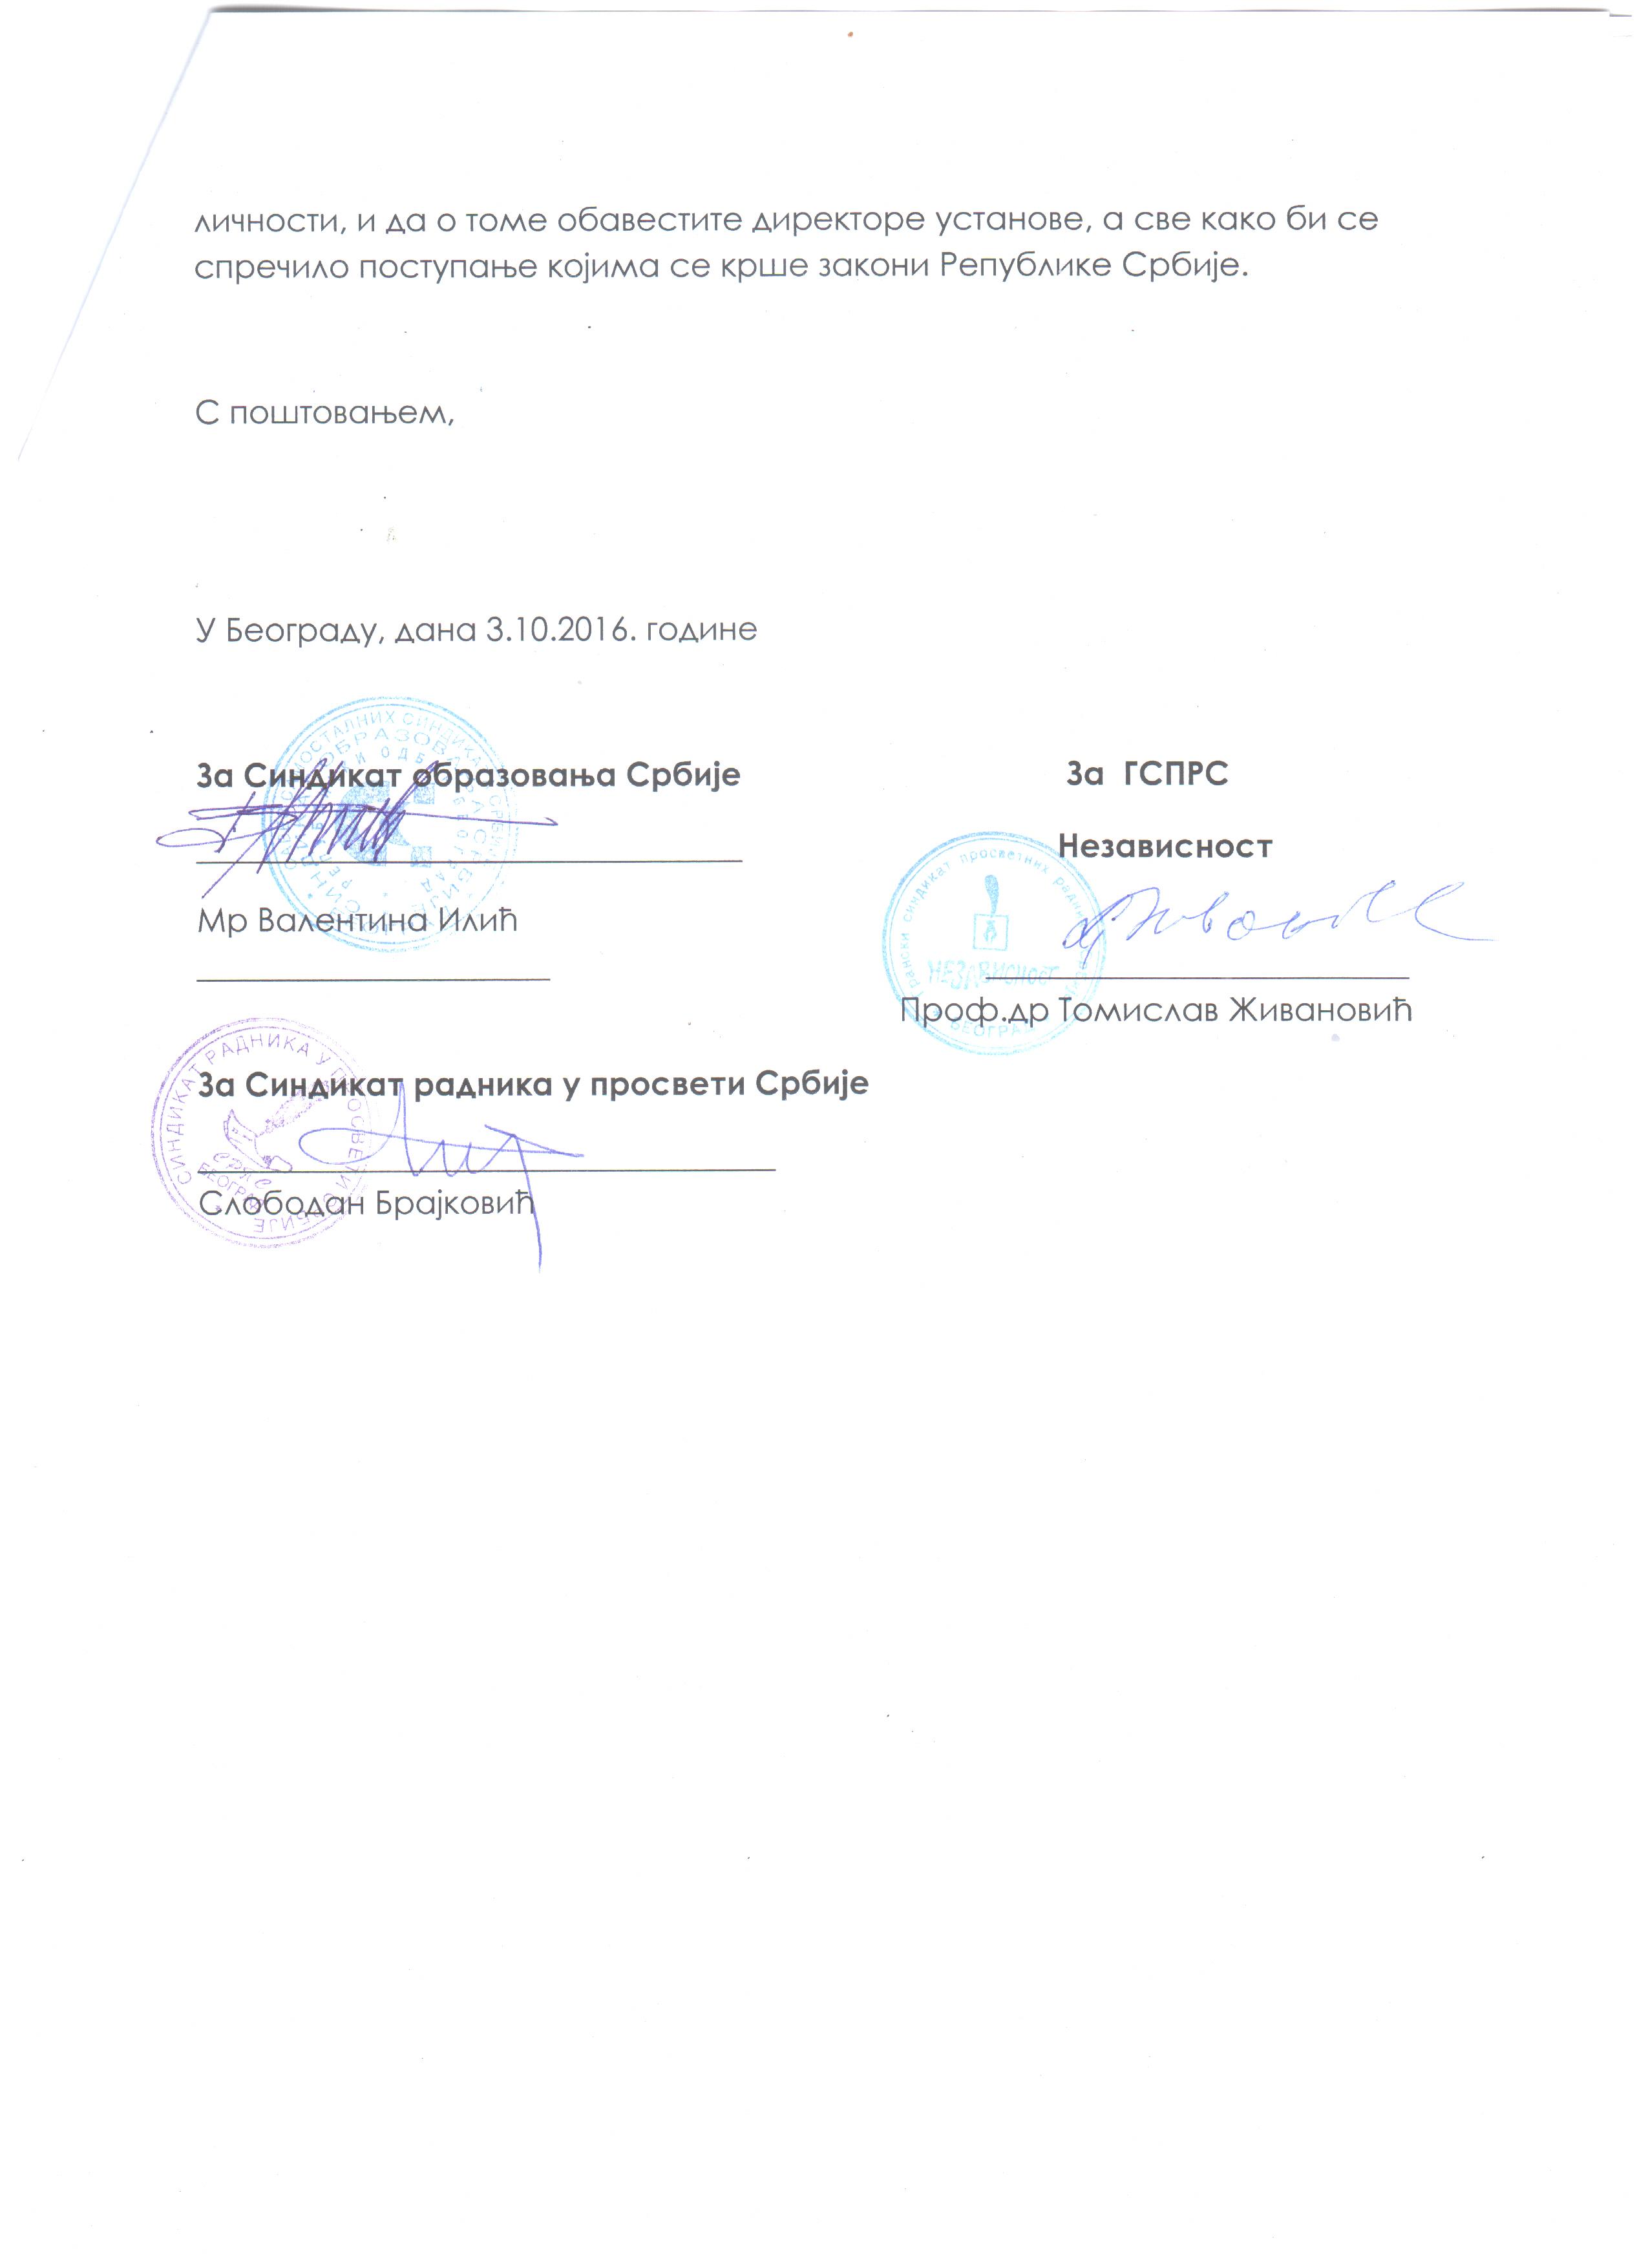 Dopis MPNTR 3